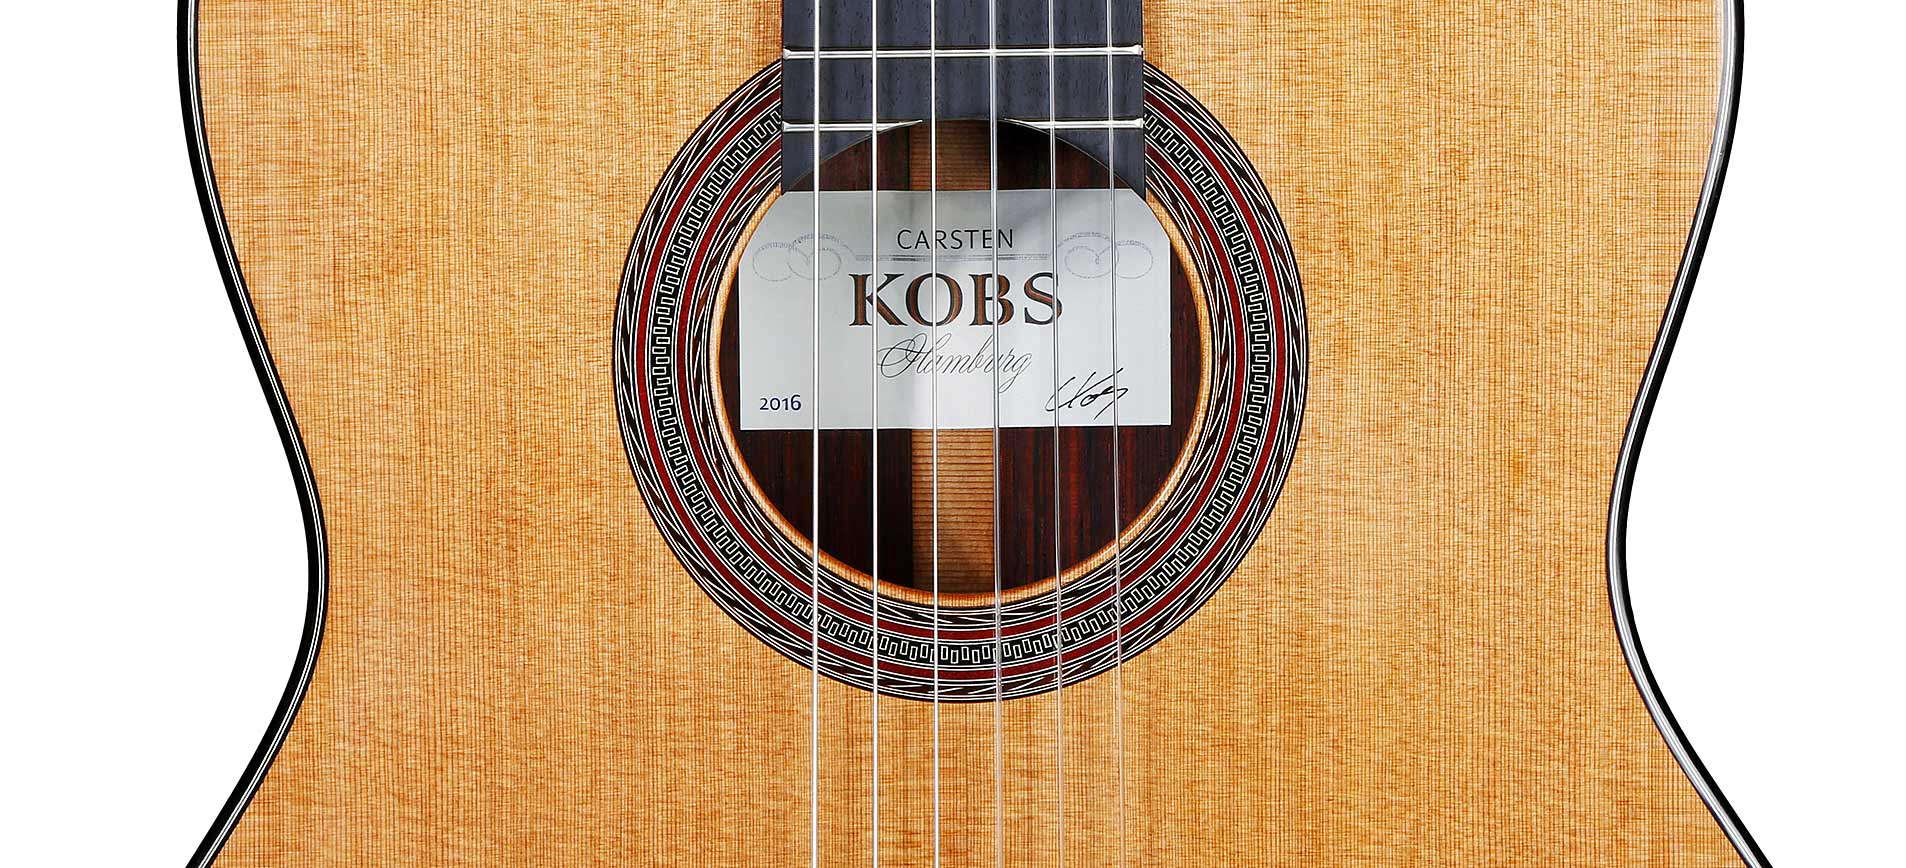 (c) Kobs.guitars